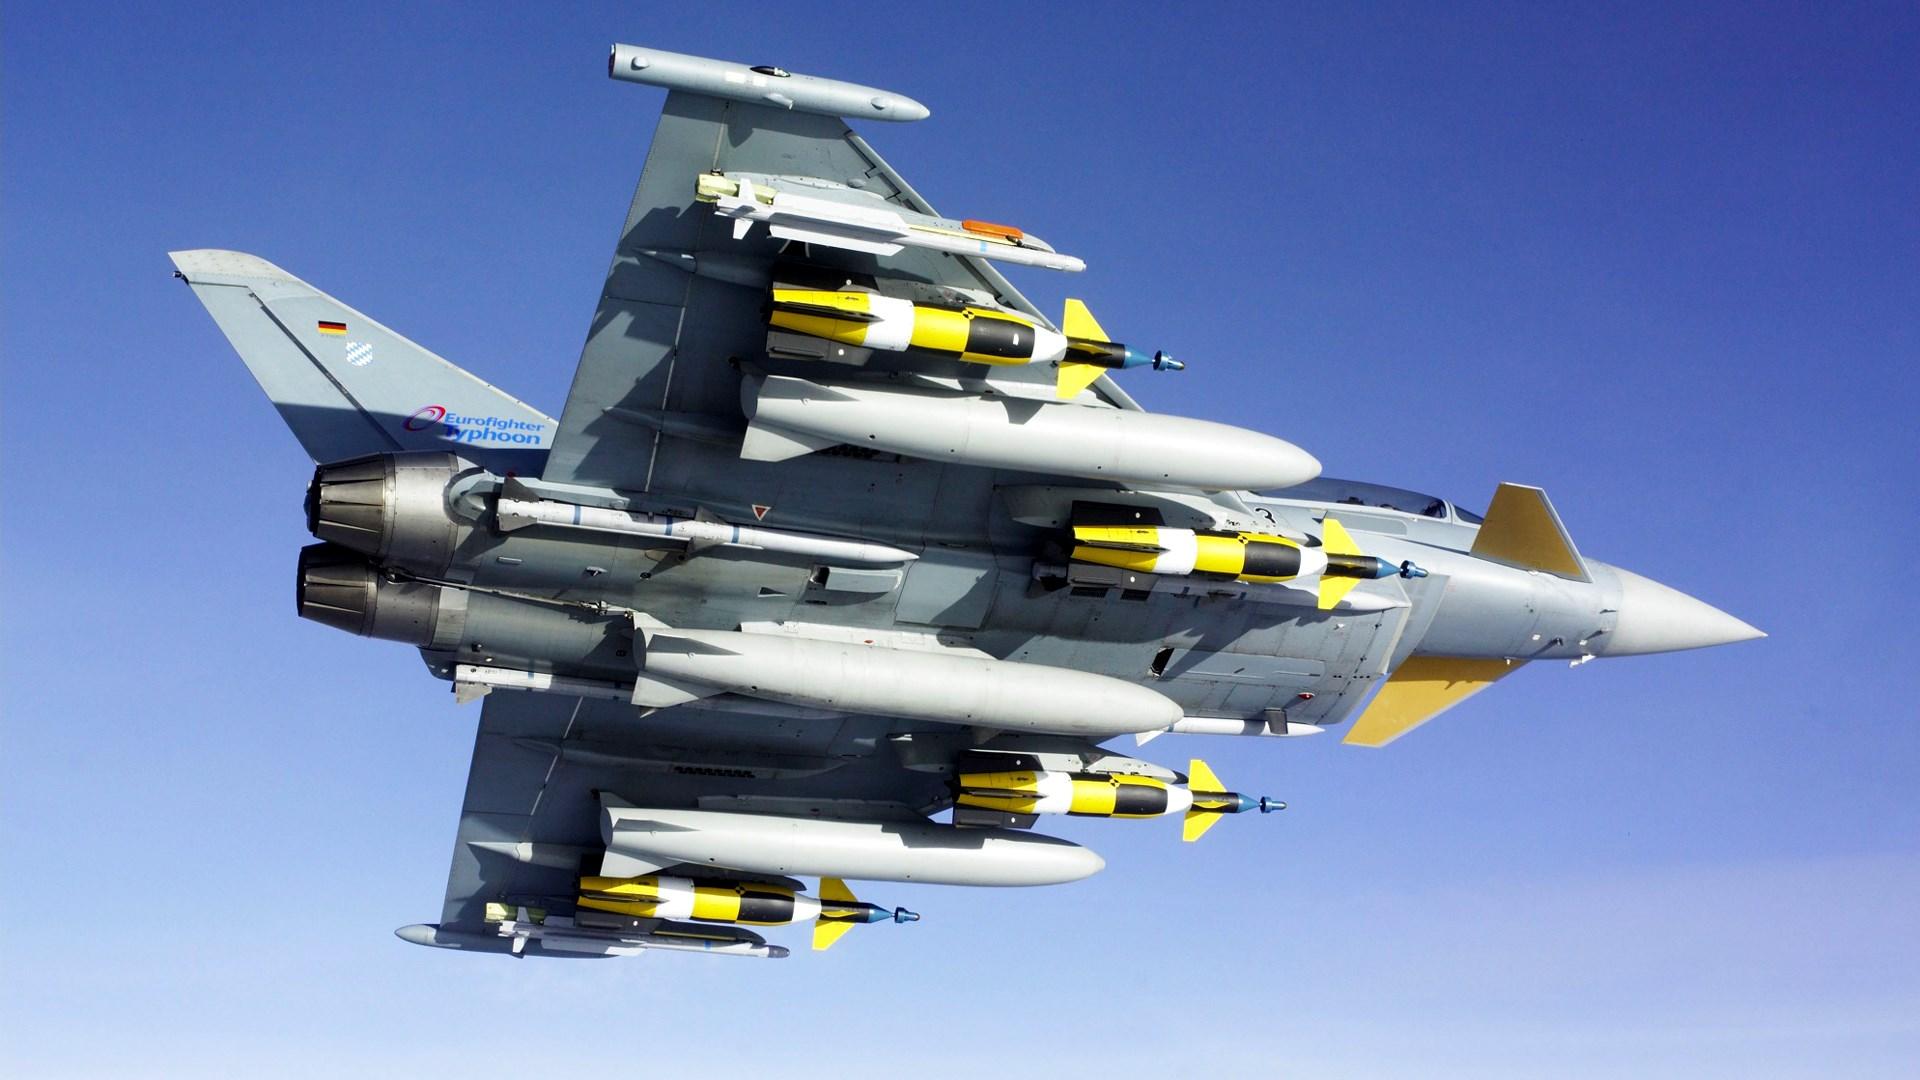 1920x1080-free-screensaver-for-eurofighter-typhoon-wallpaper-wp340828